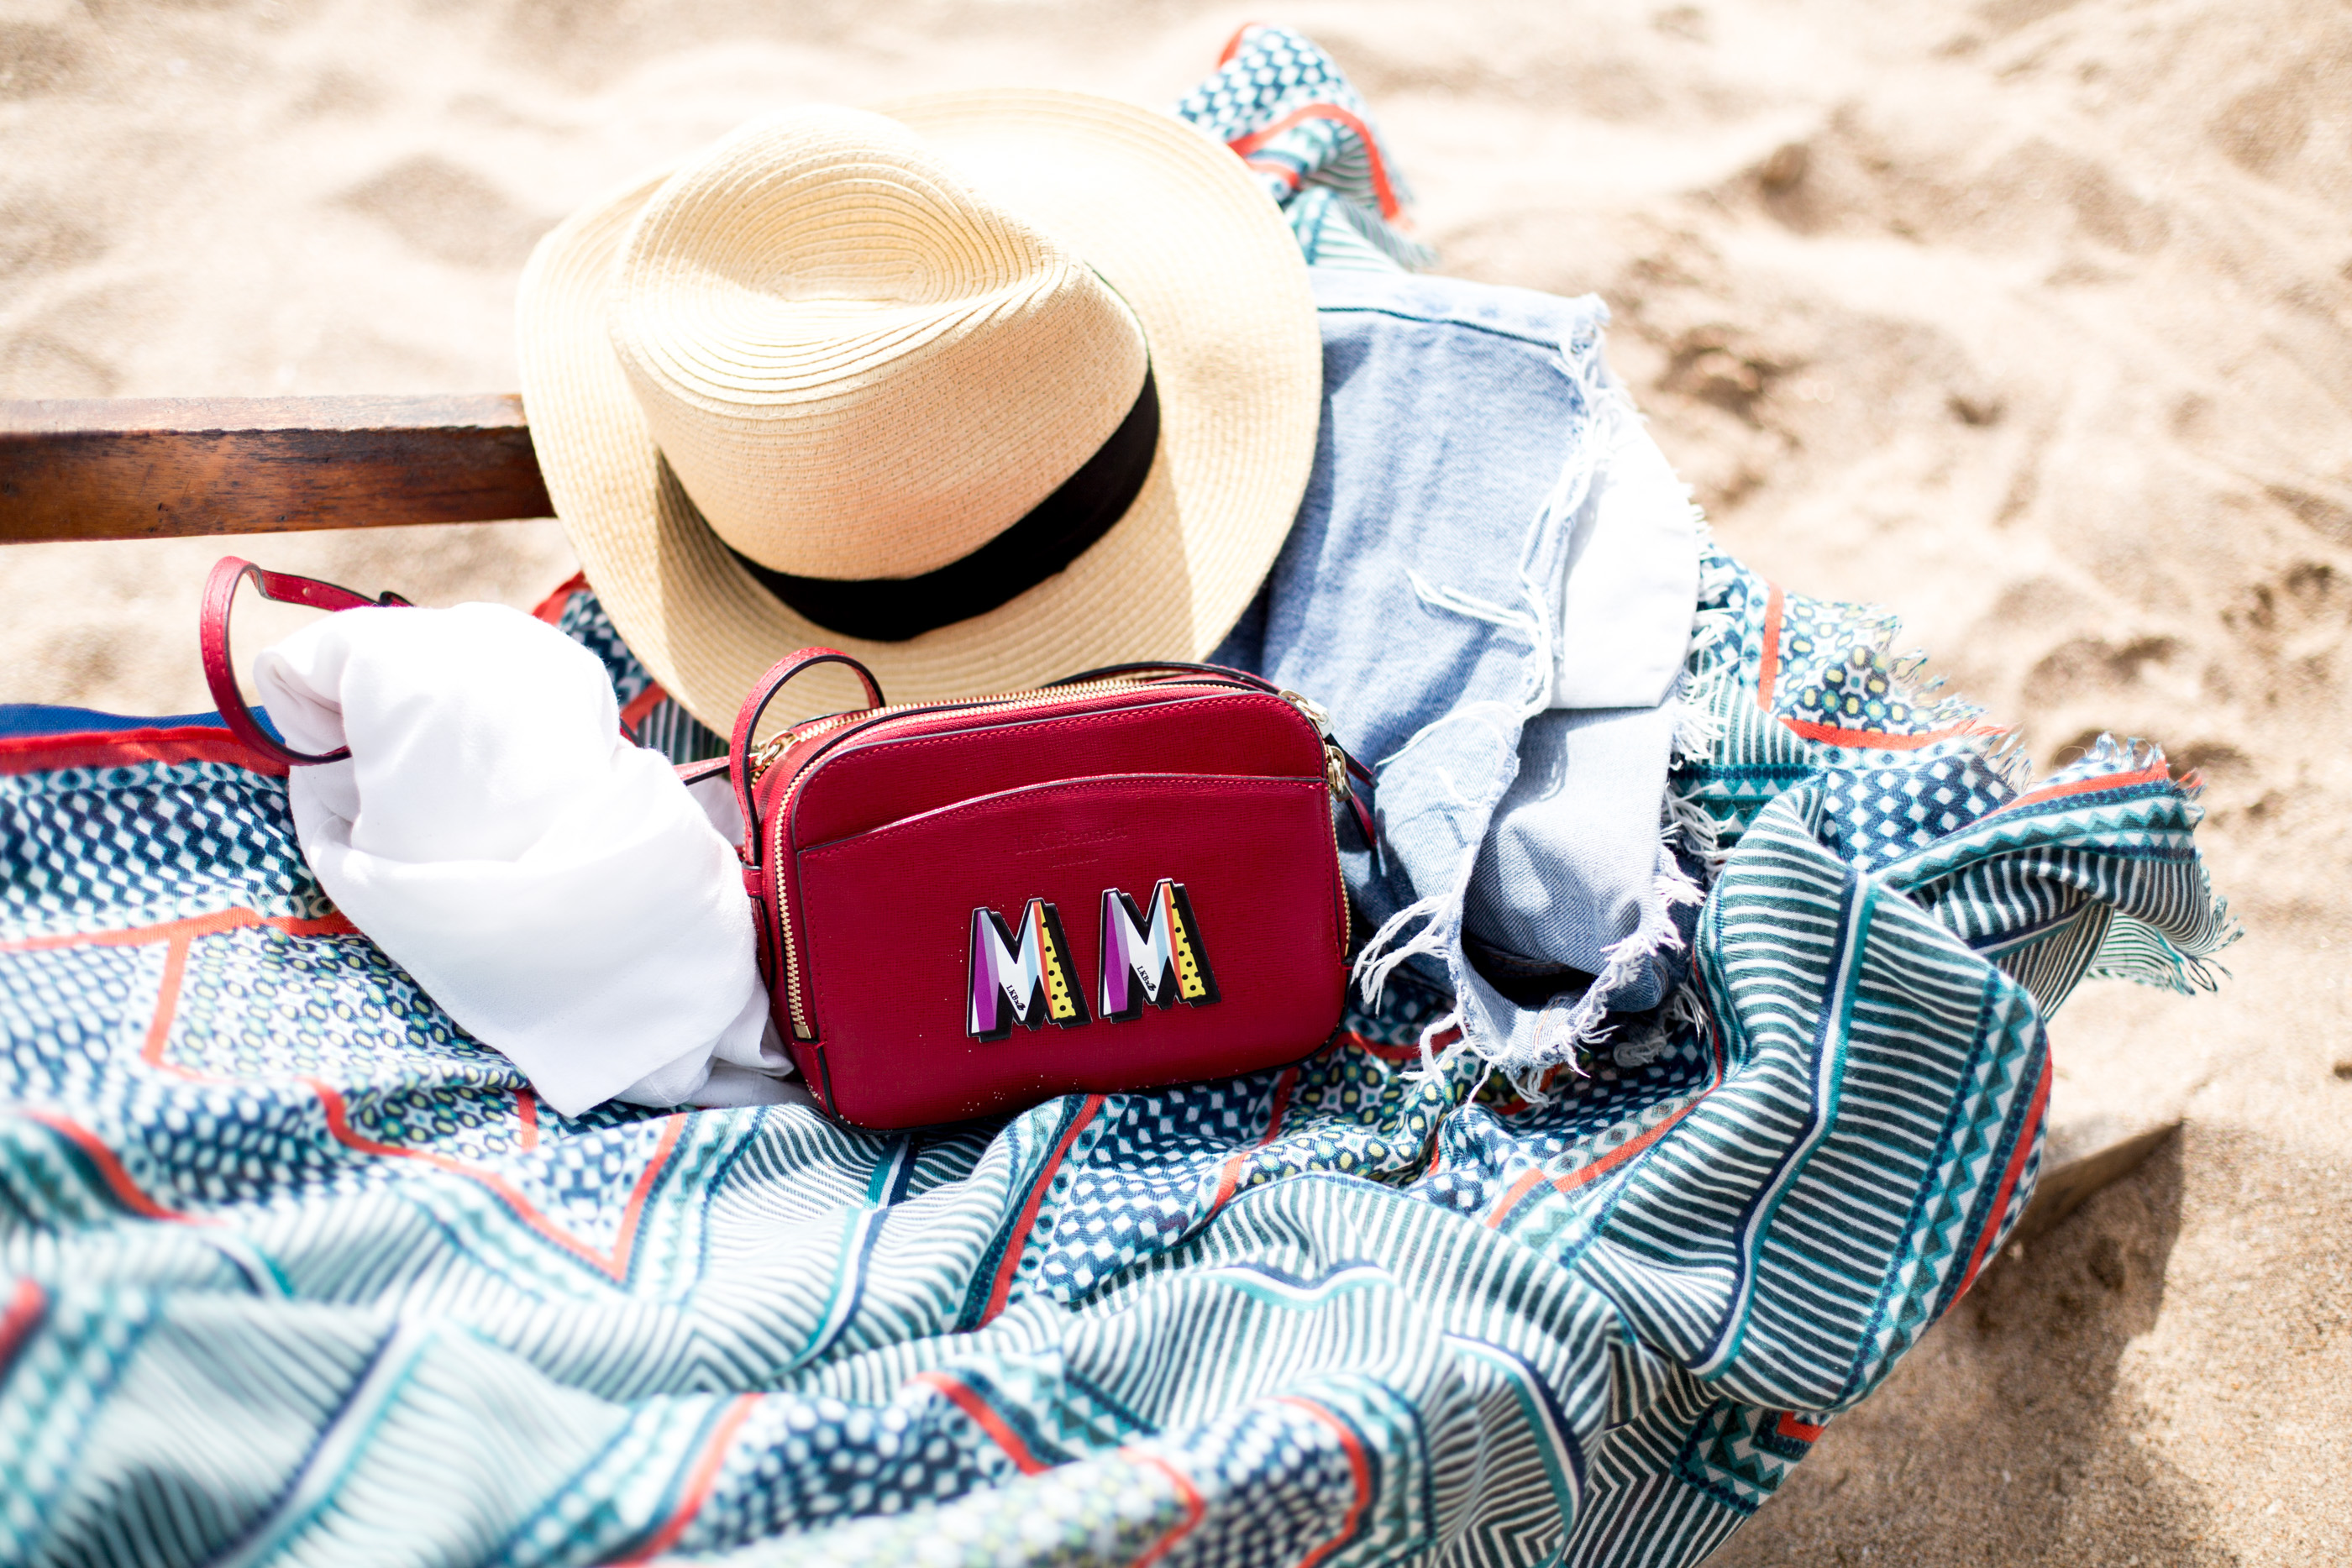 mediamarmalade_koh_lanta_beach-75